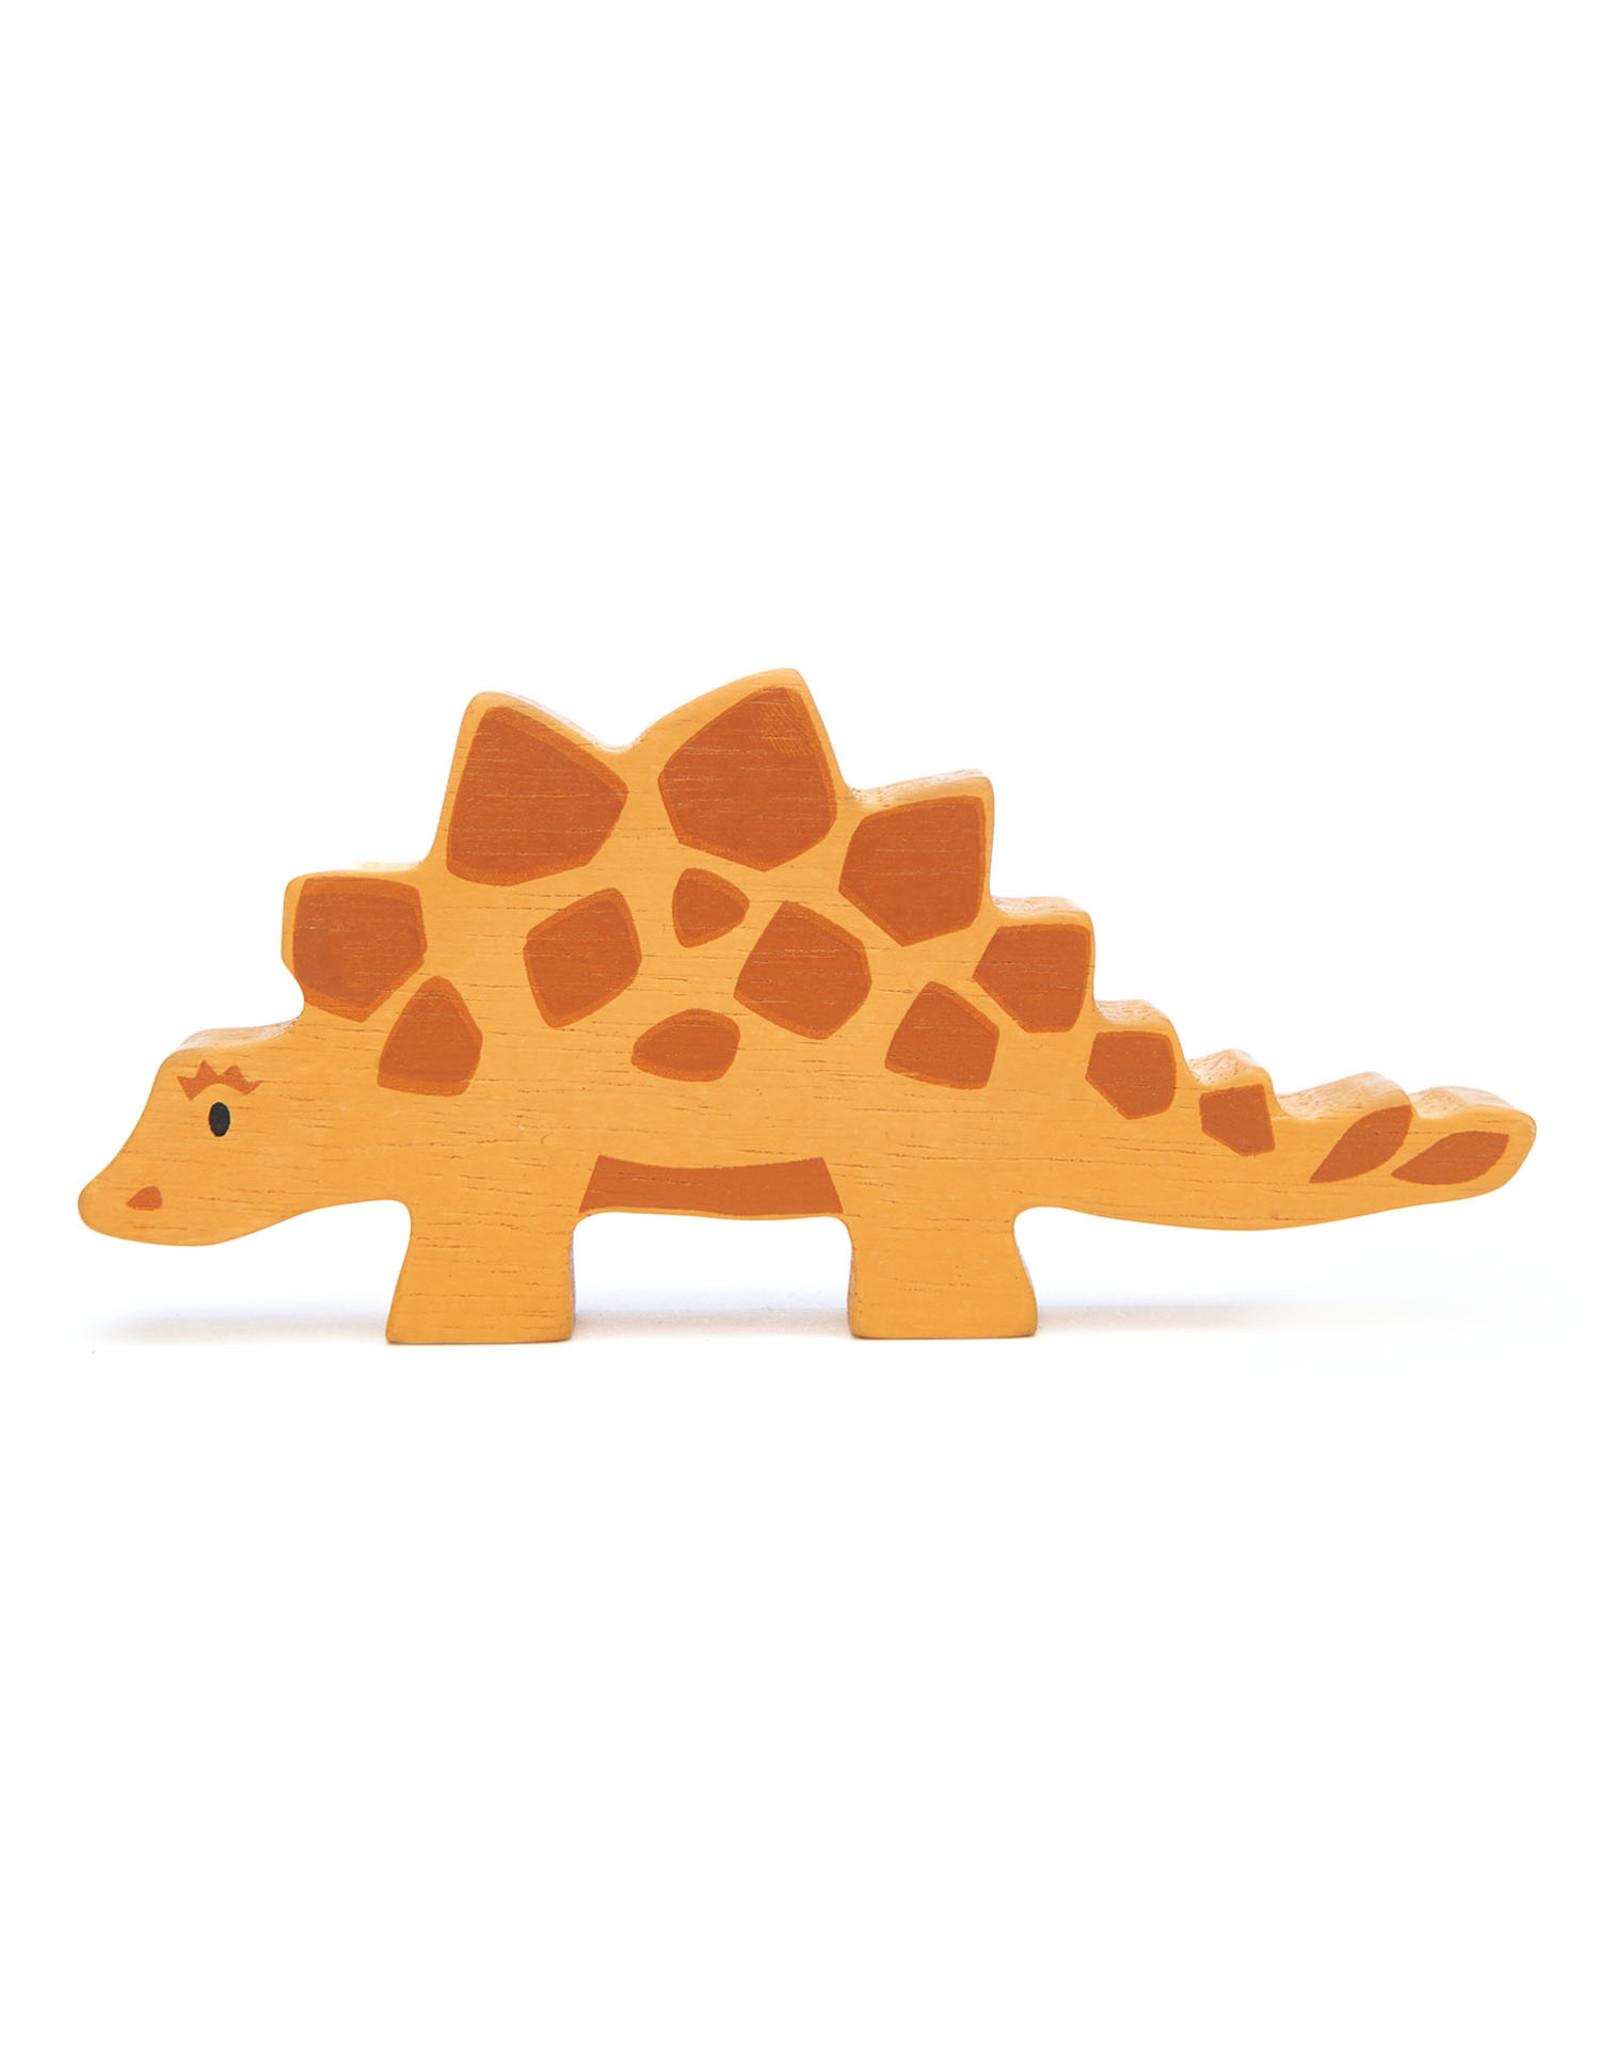 Tender Leaf Toys Dinosaurs - Stegosaurs